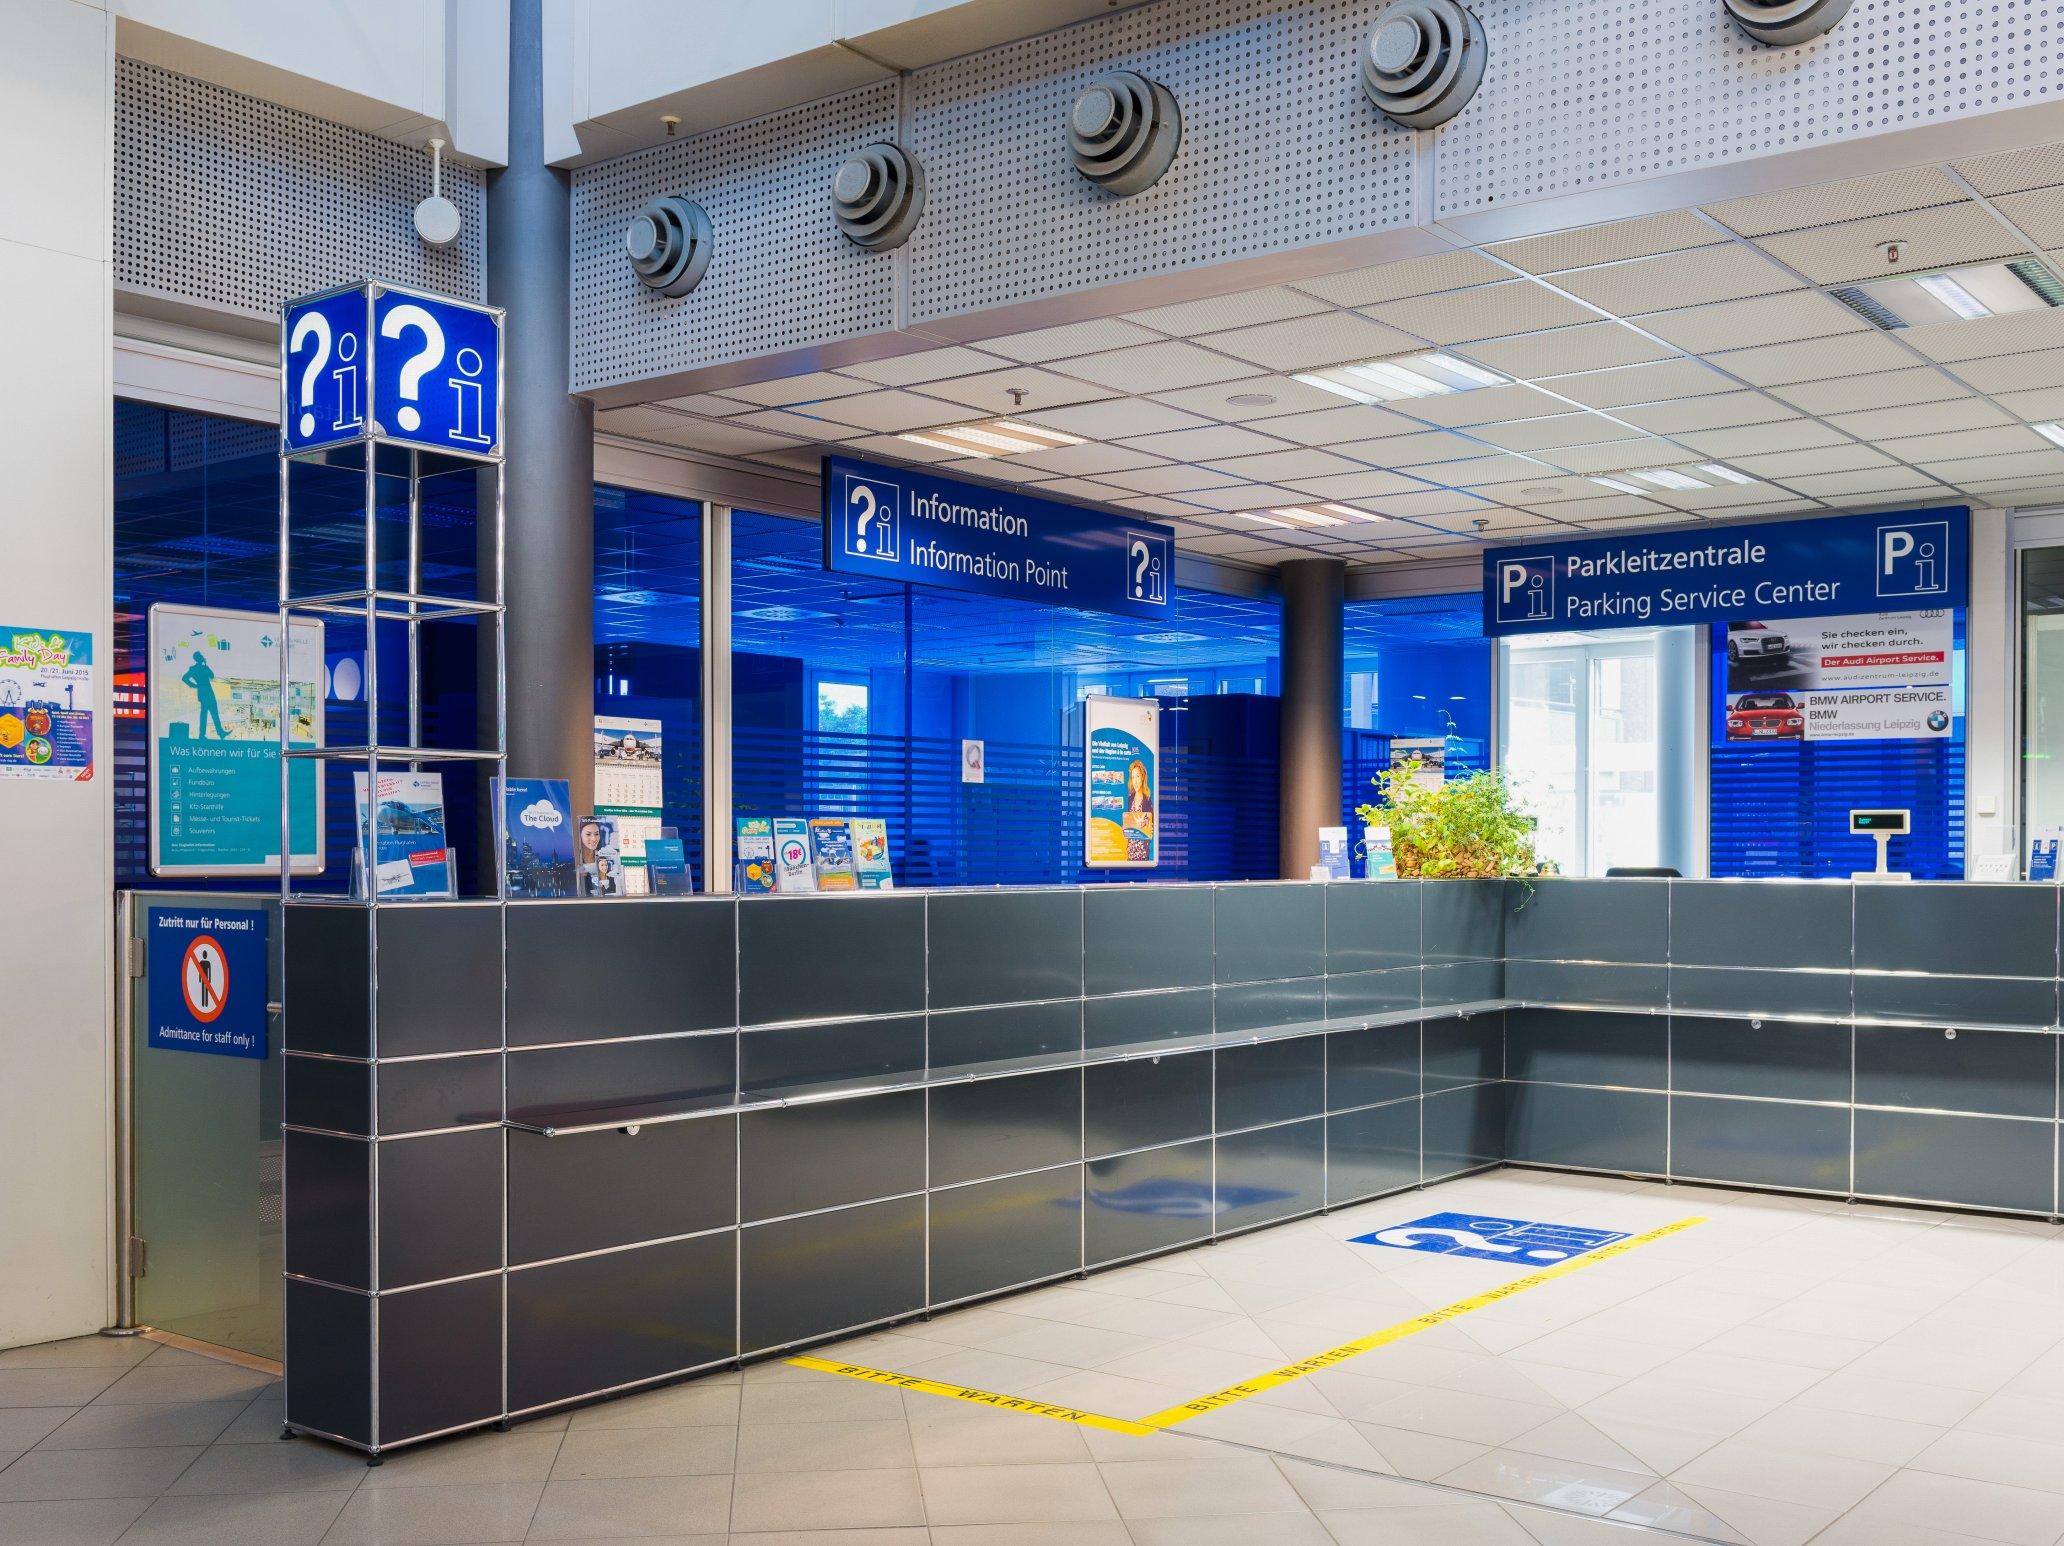 USM Airport Halle-Leipzig Infotheke